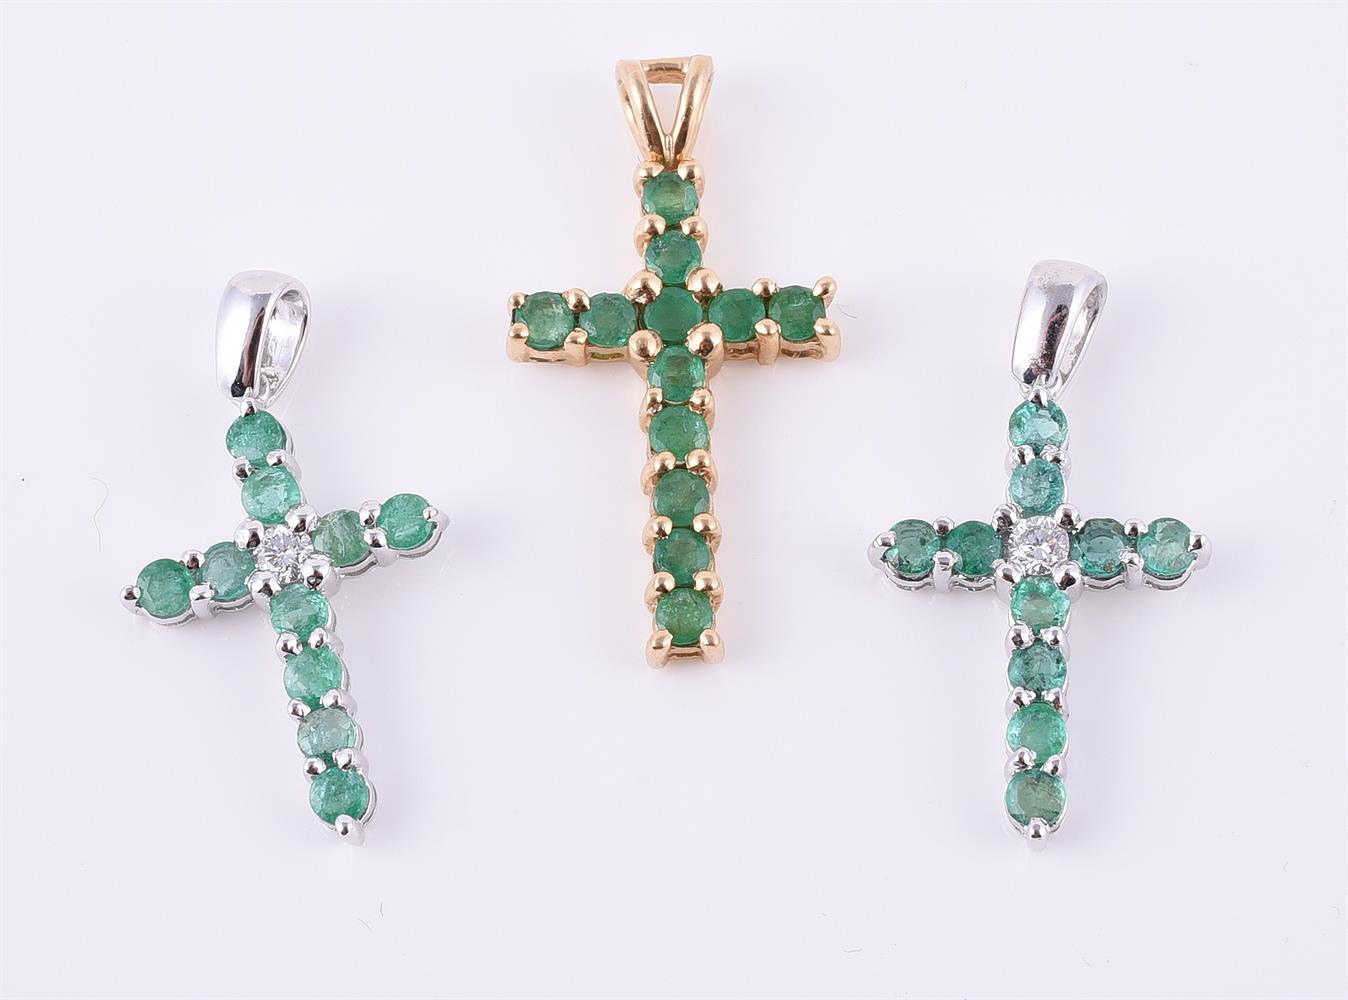 Two emerald and diamond crosses